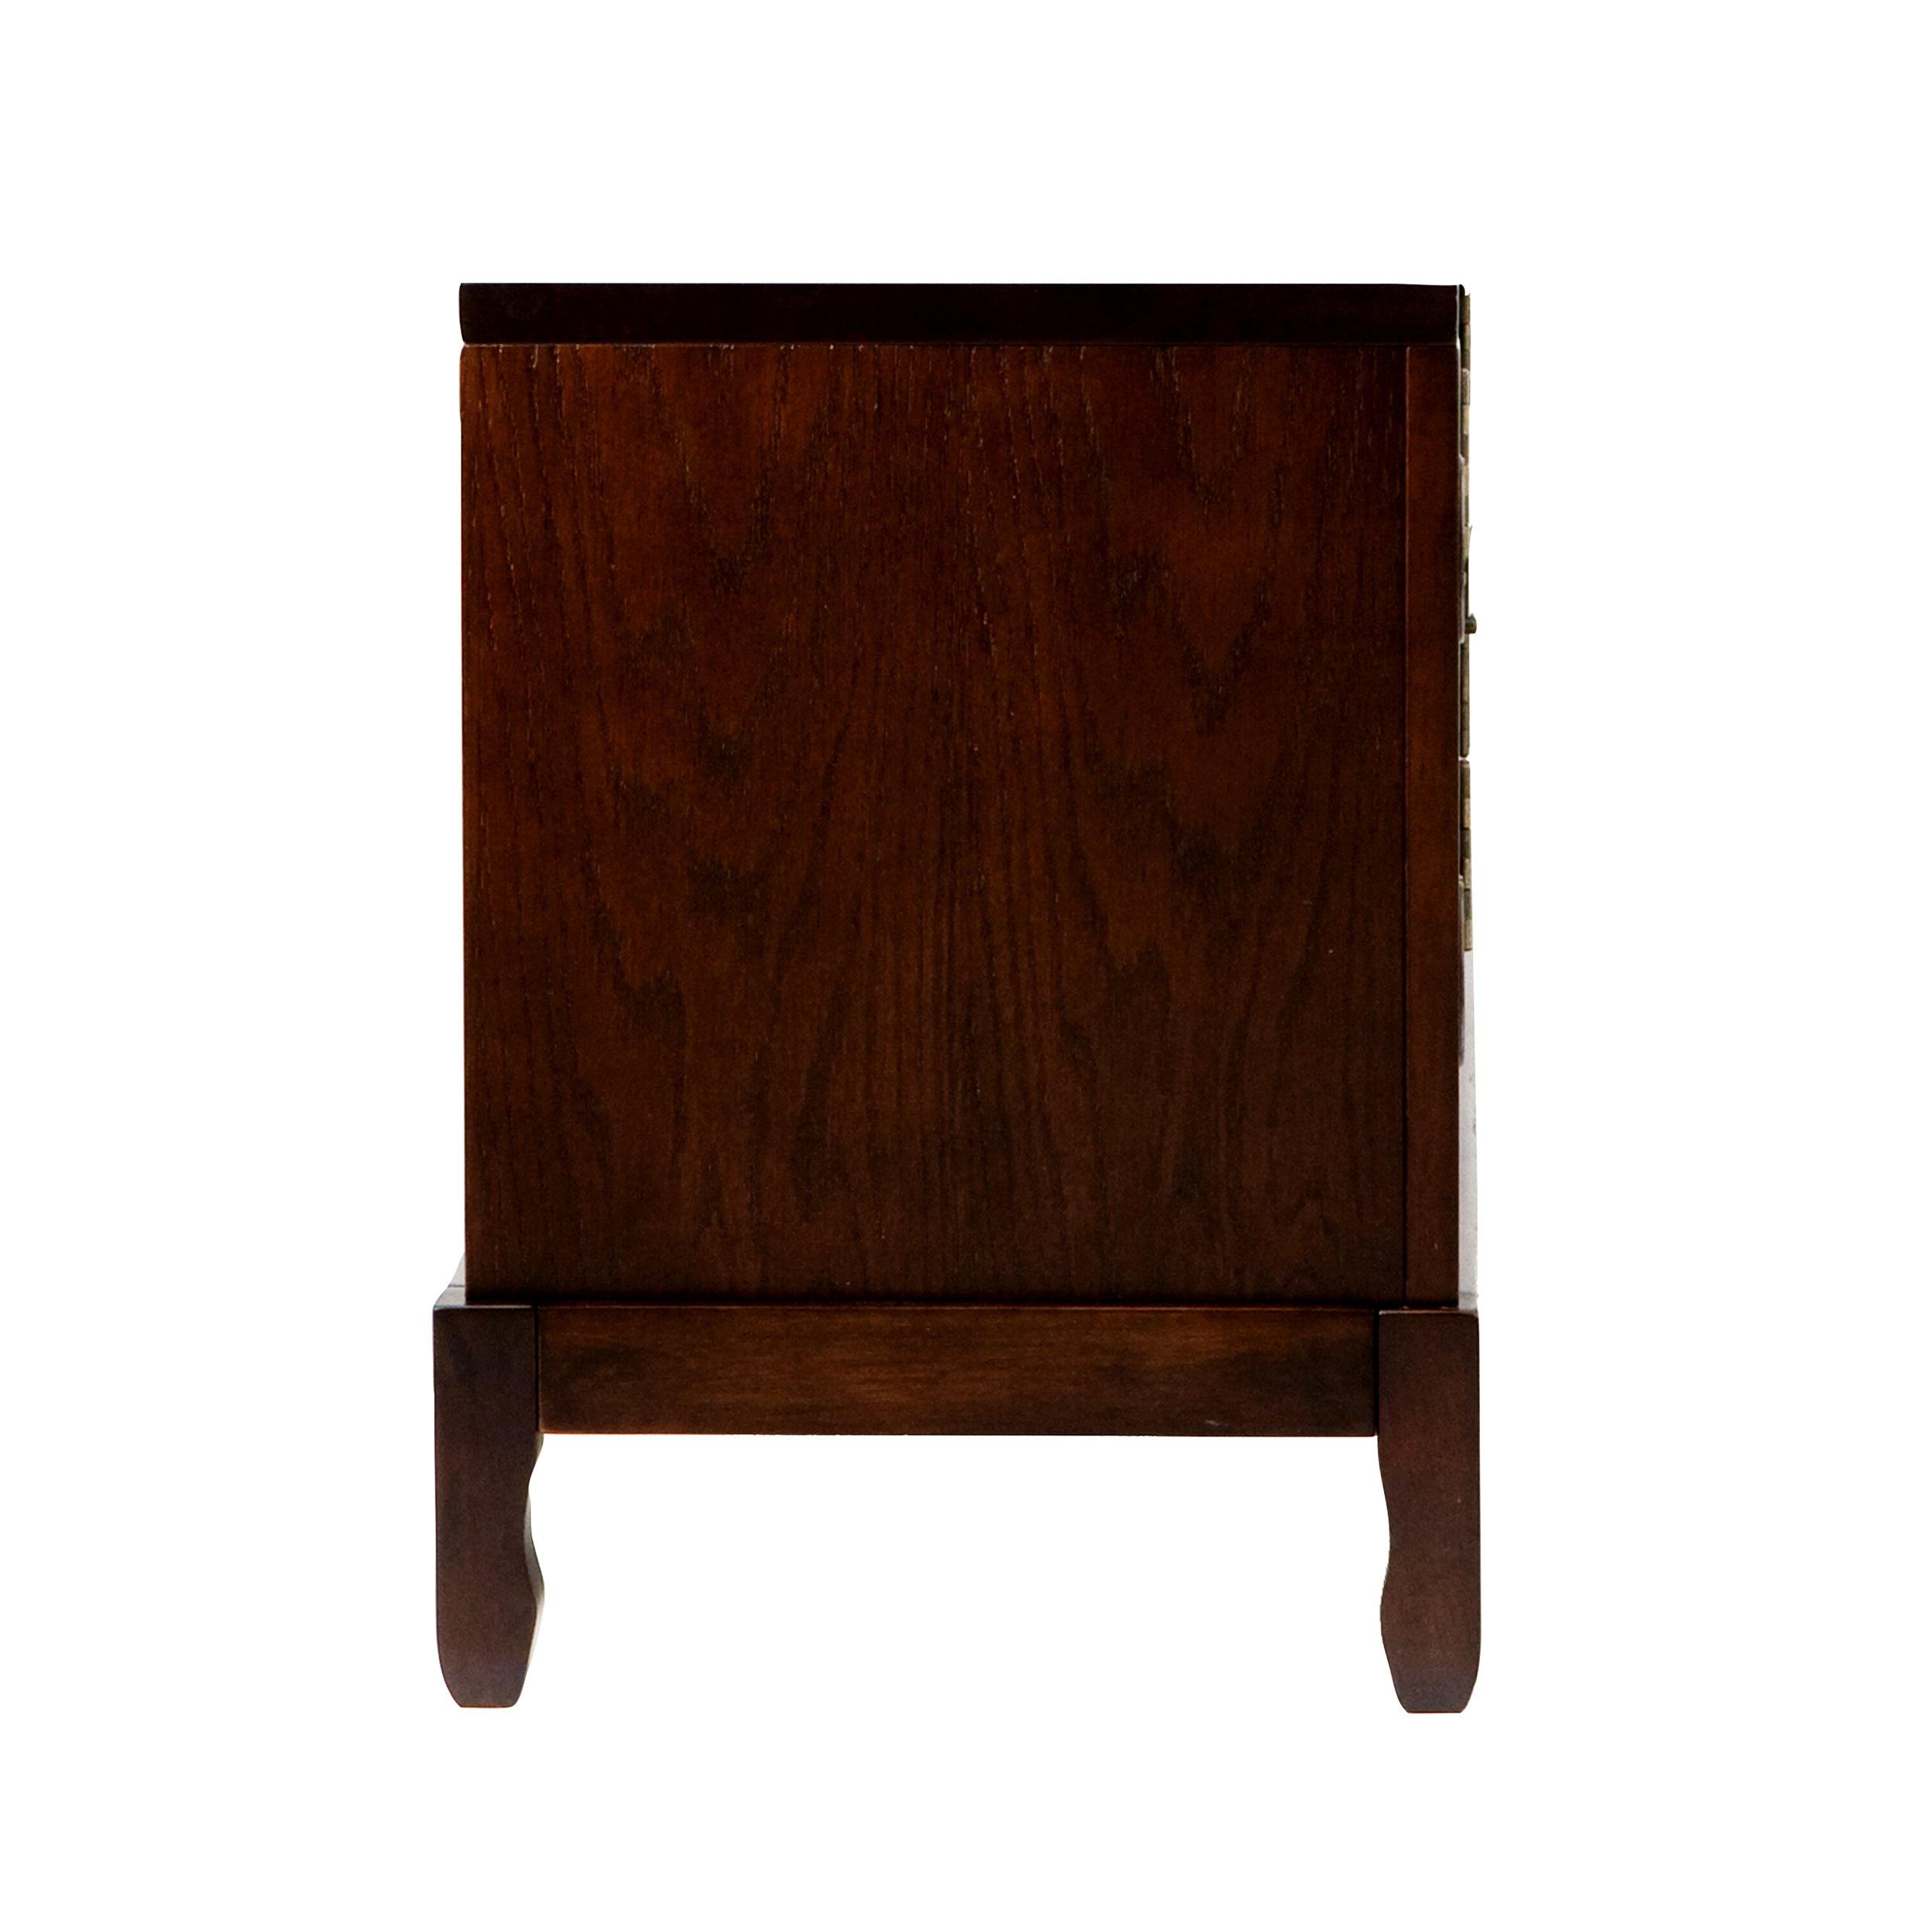 Side Cabinets w// Adjustable Shelves Dynasty Media Cabinet TV Stand w// Expresso Finish